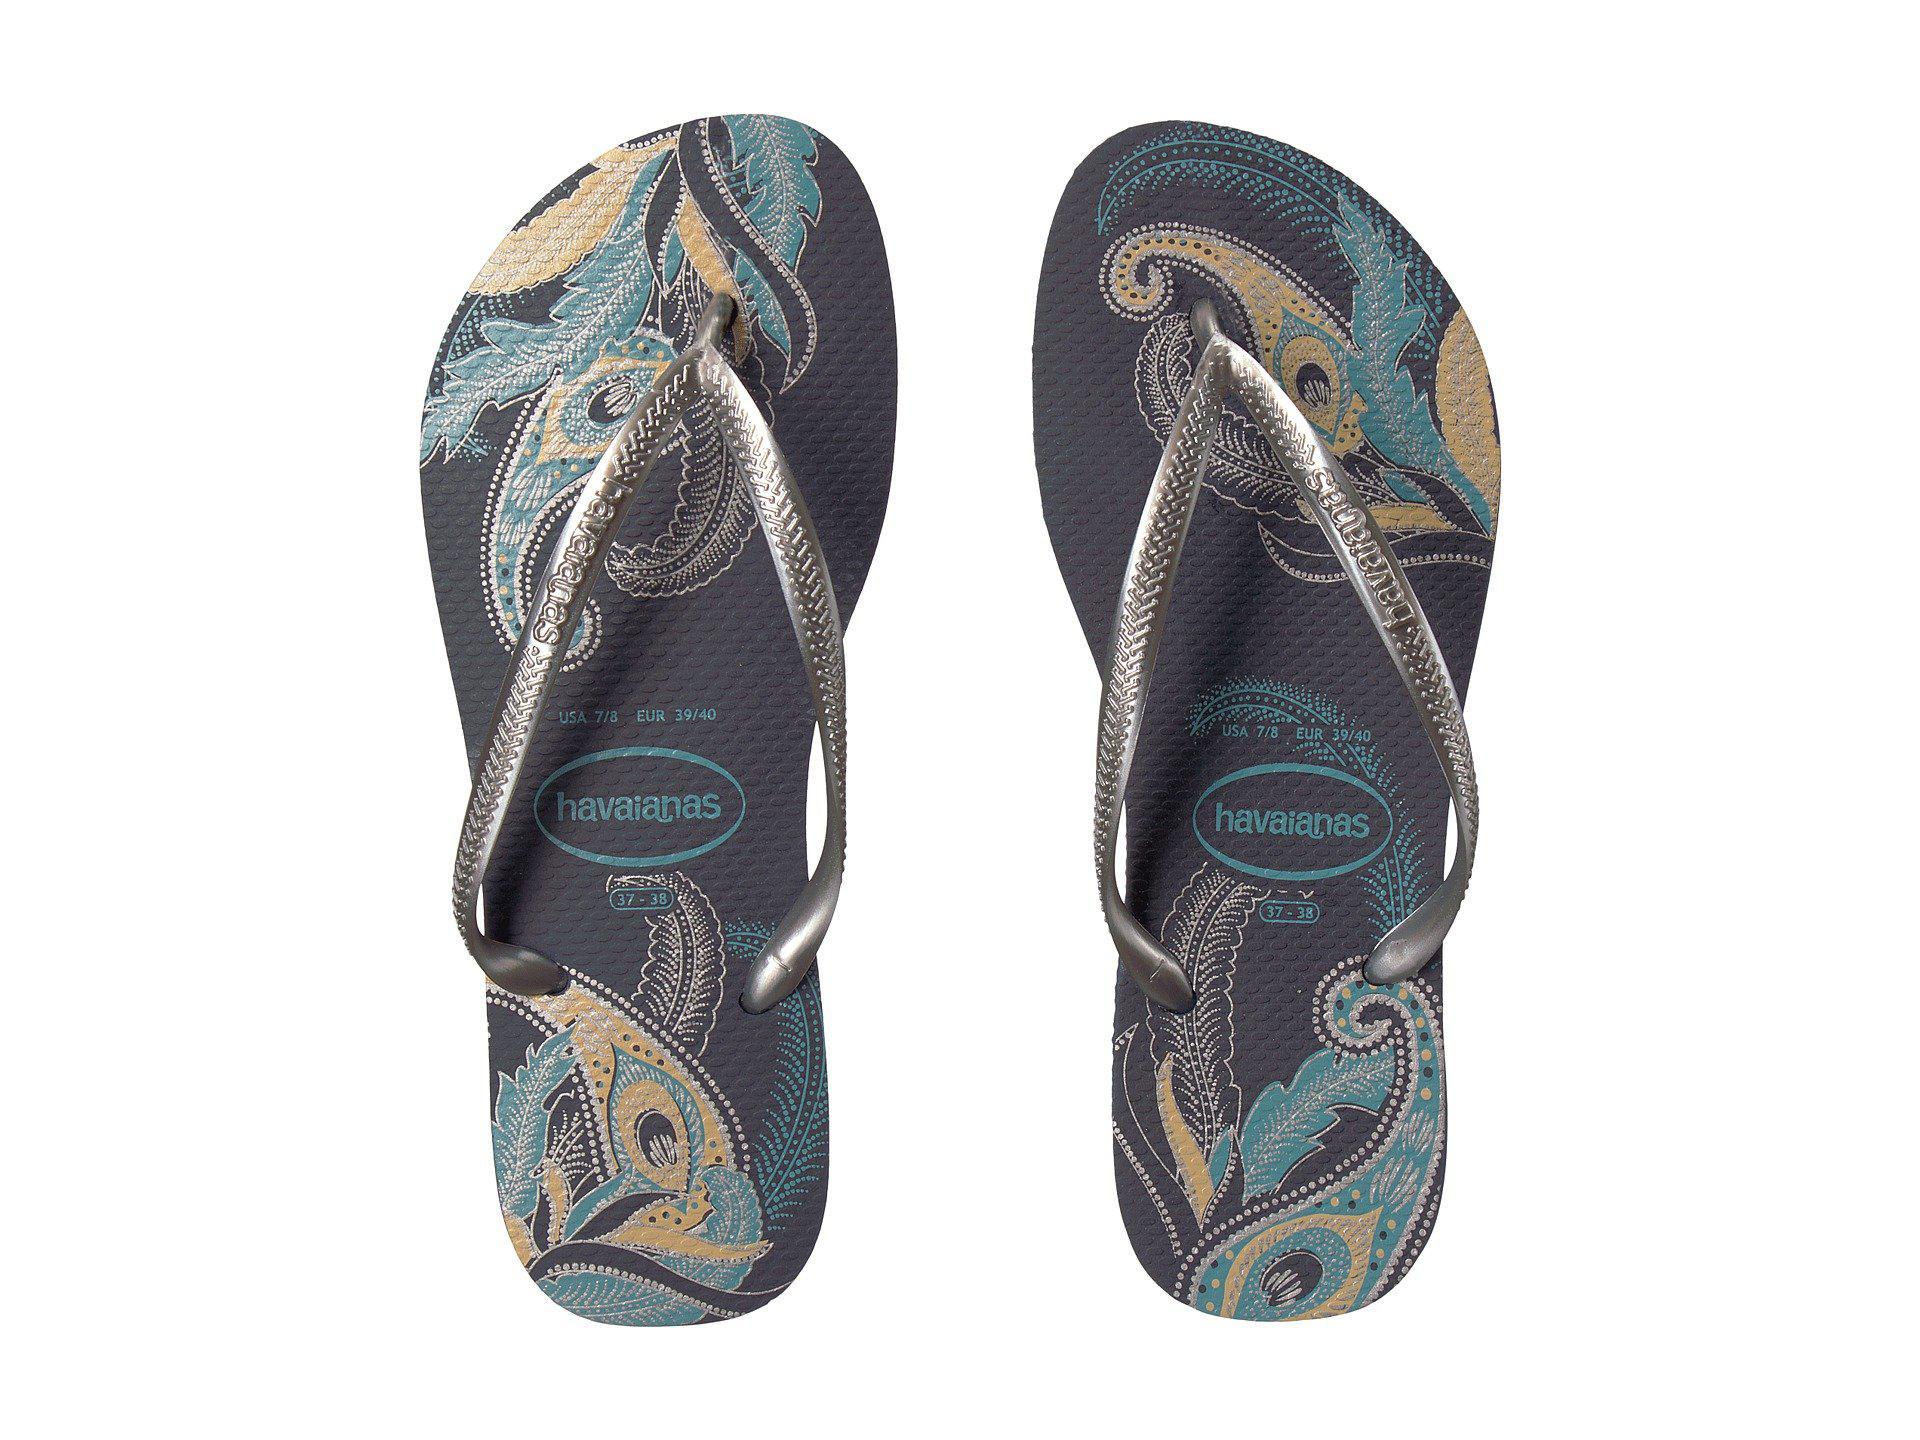 1721f03e8 Lyst - Havaianas Slim Organic Flip Flop Sandals